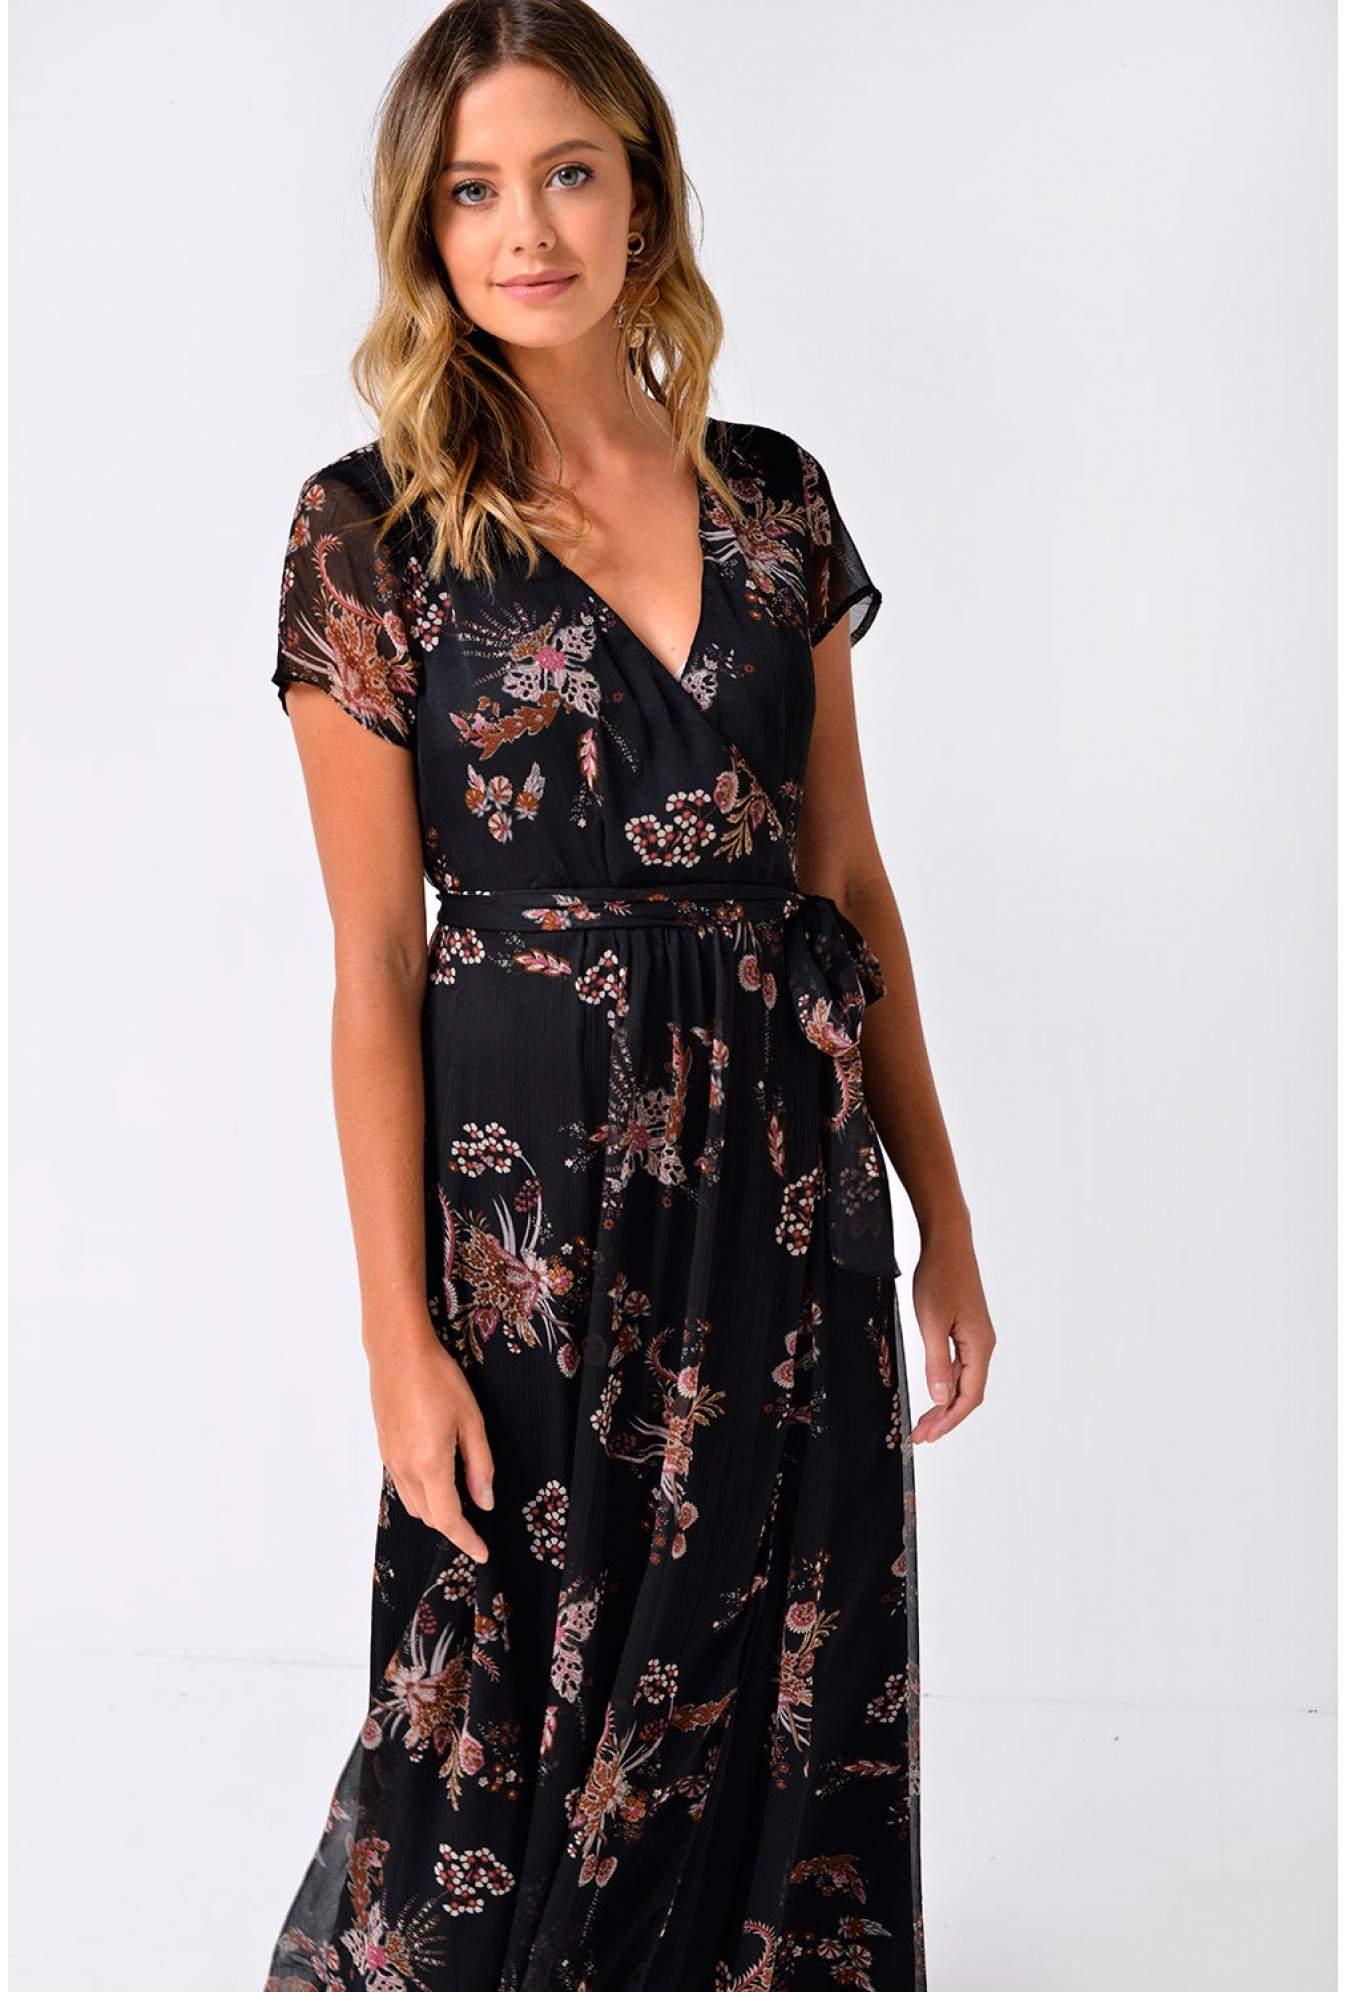 72f1474a33d68 Vero Moda Queen Maxi Dress in Black | iCLOTHING